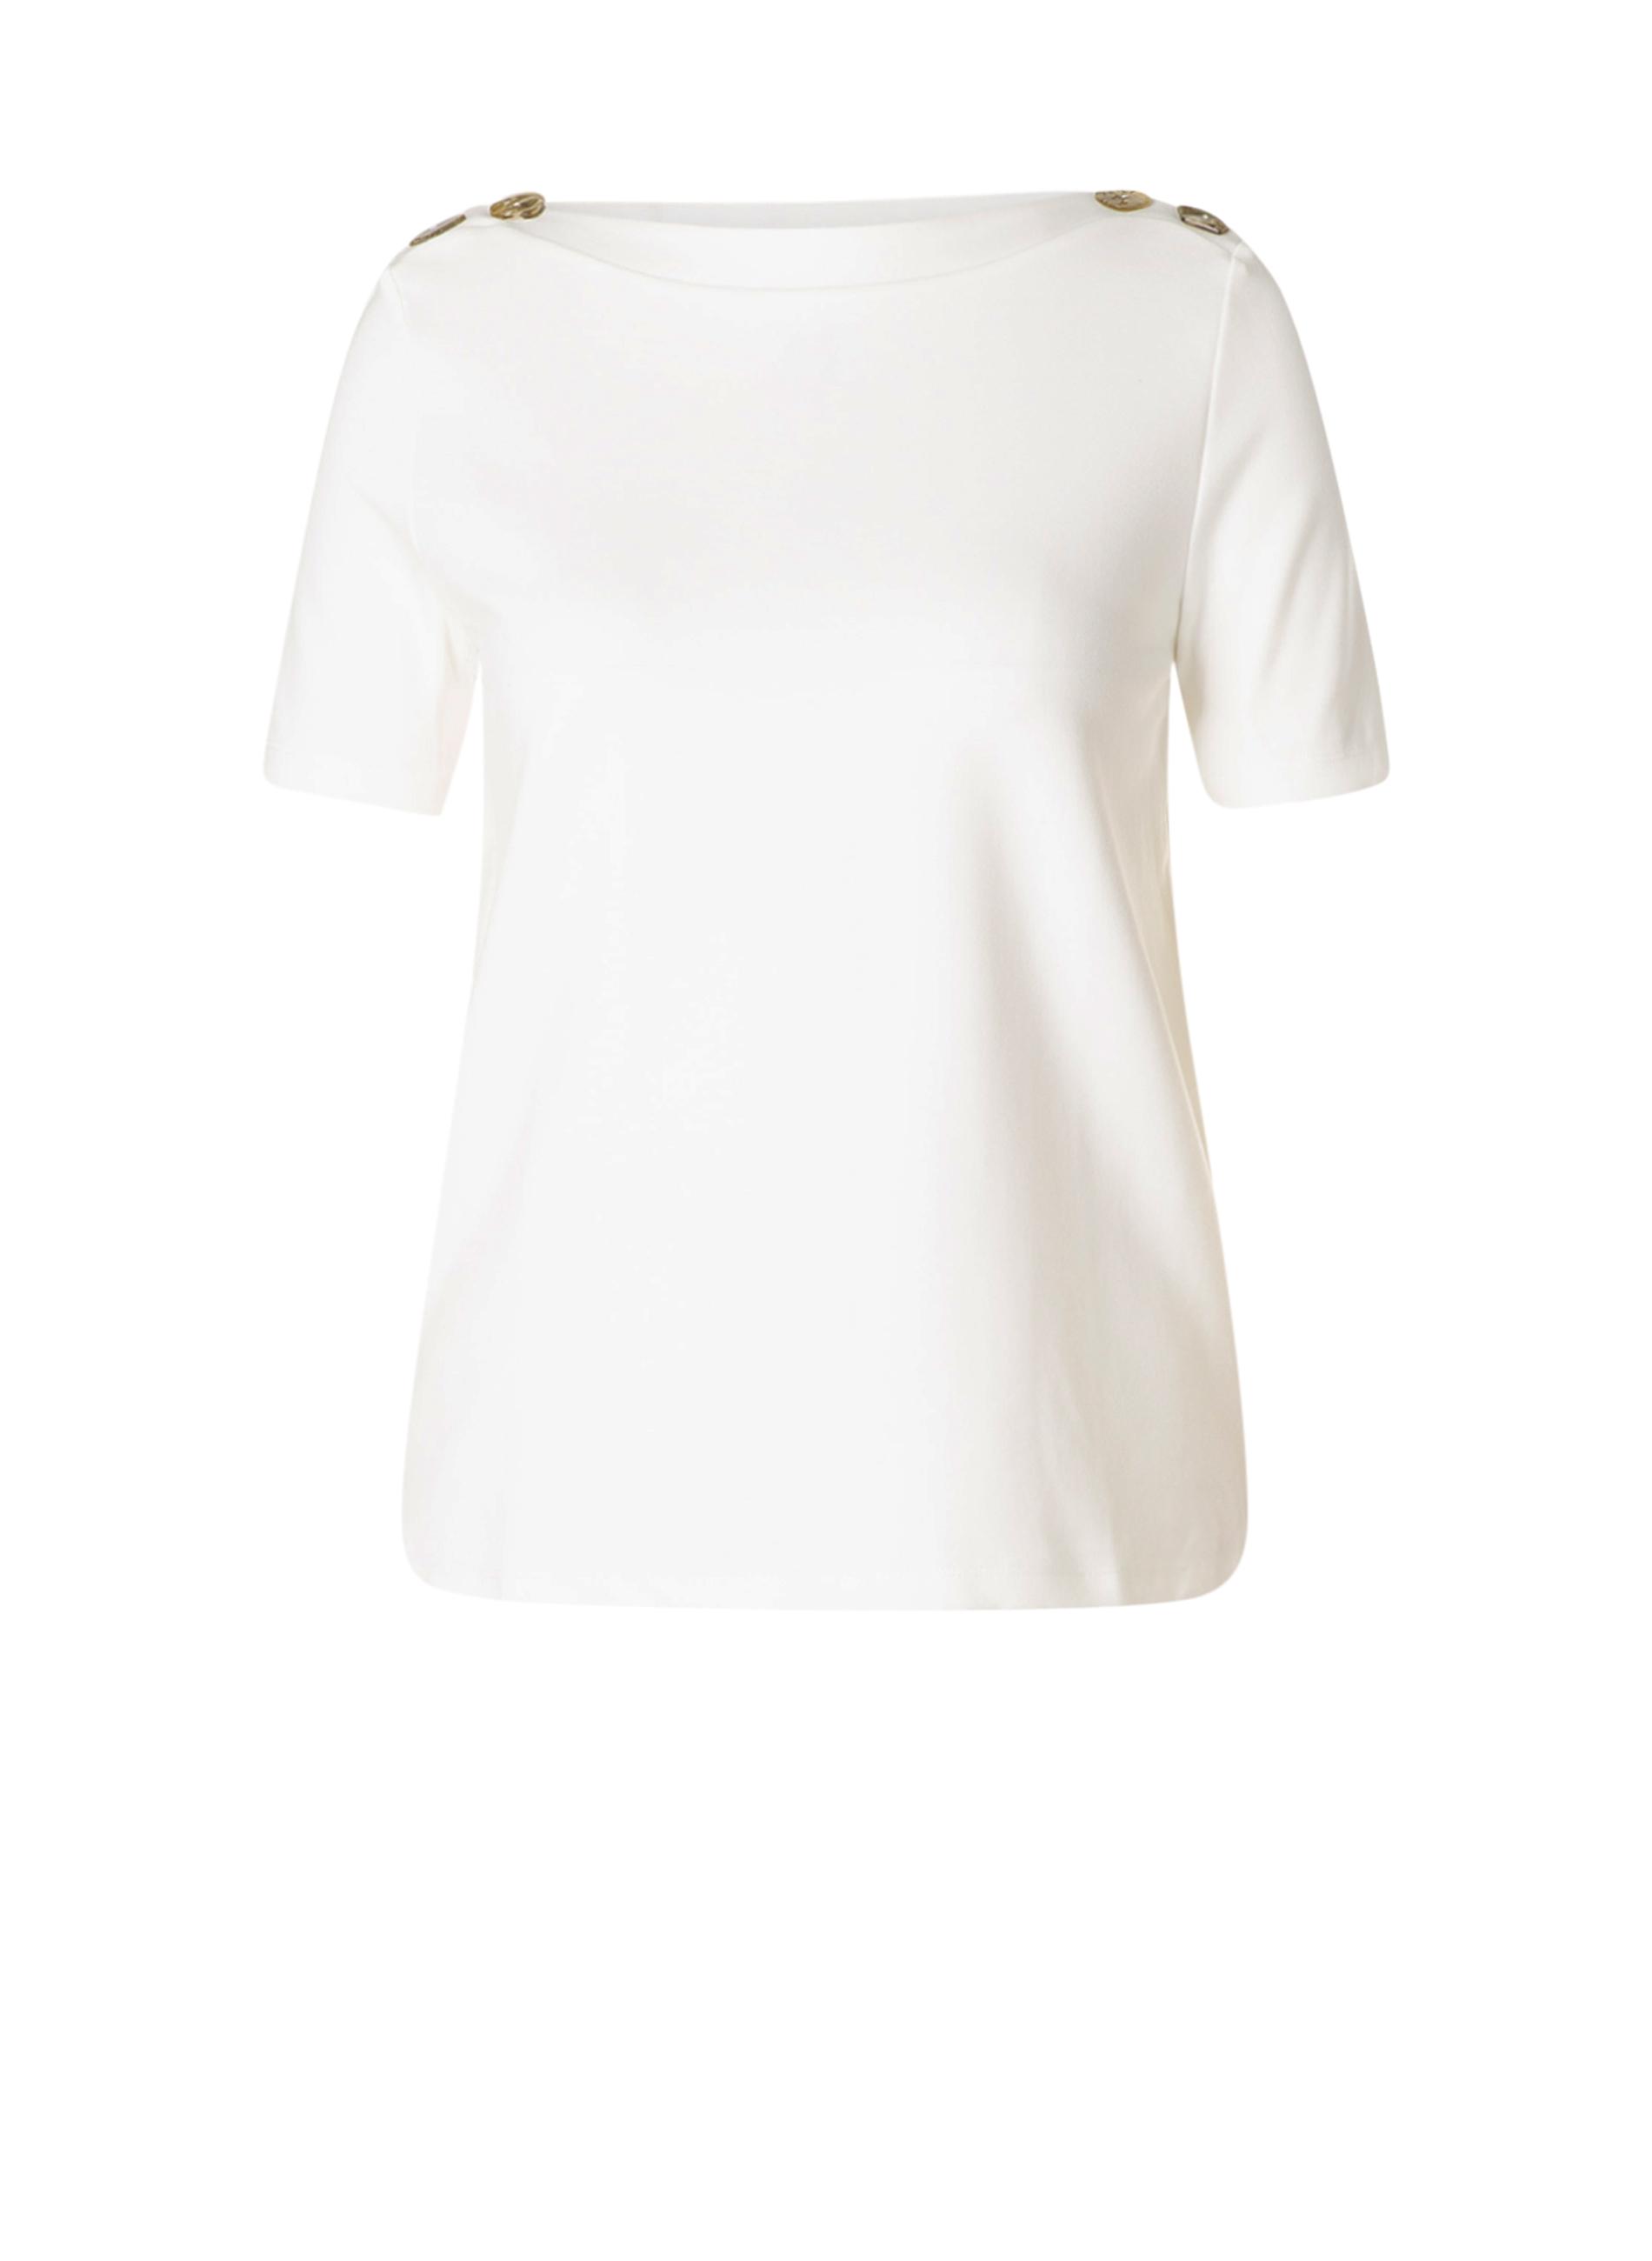 Shirt Hillary 74 cm Yesta